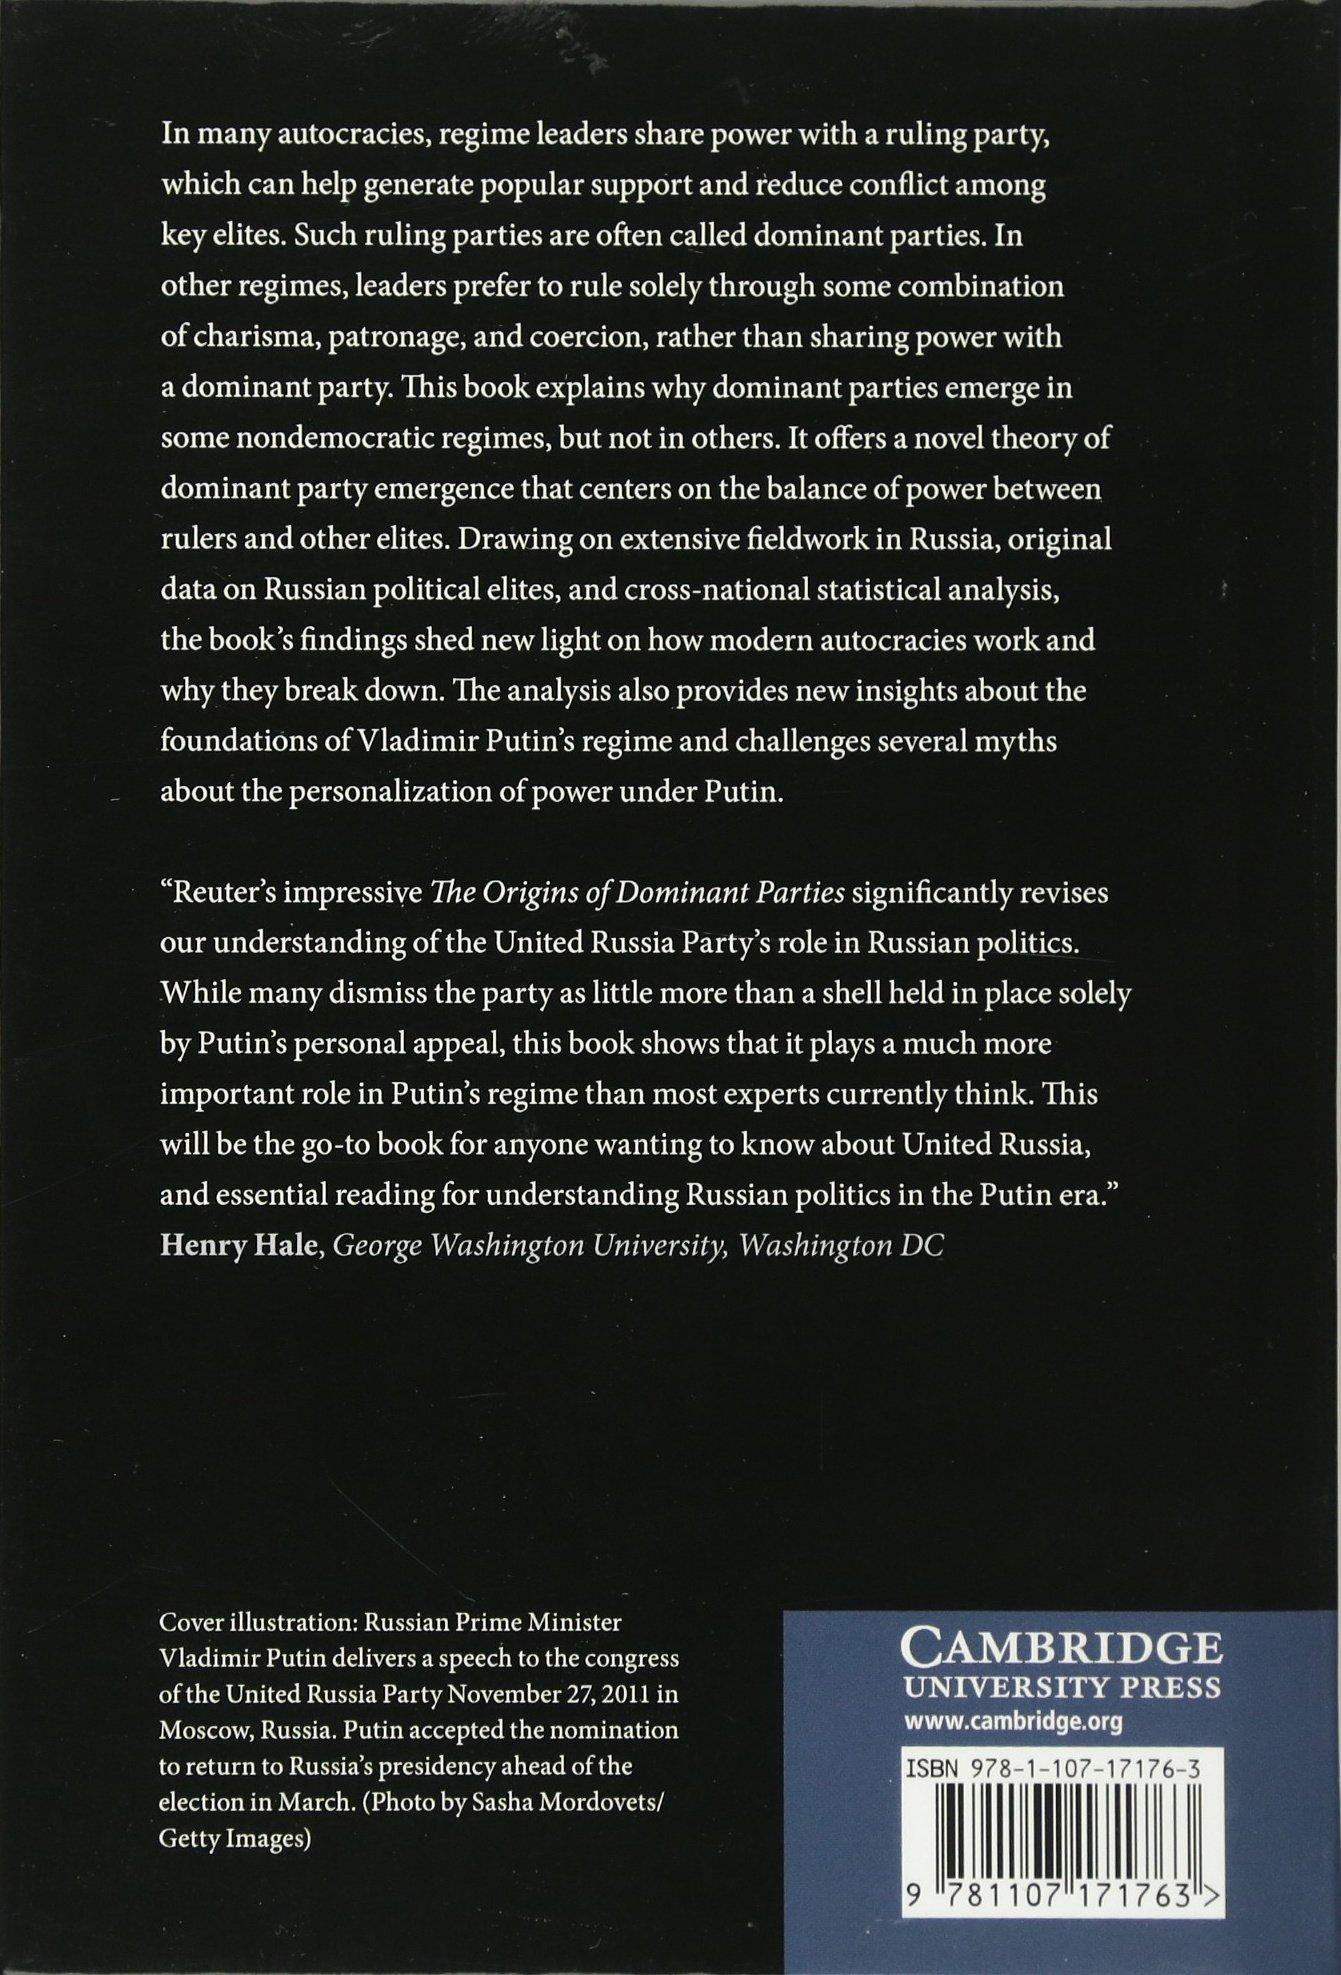 the origins of dominant parties building authoritarian